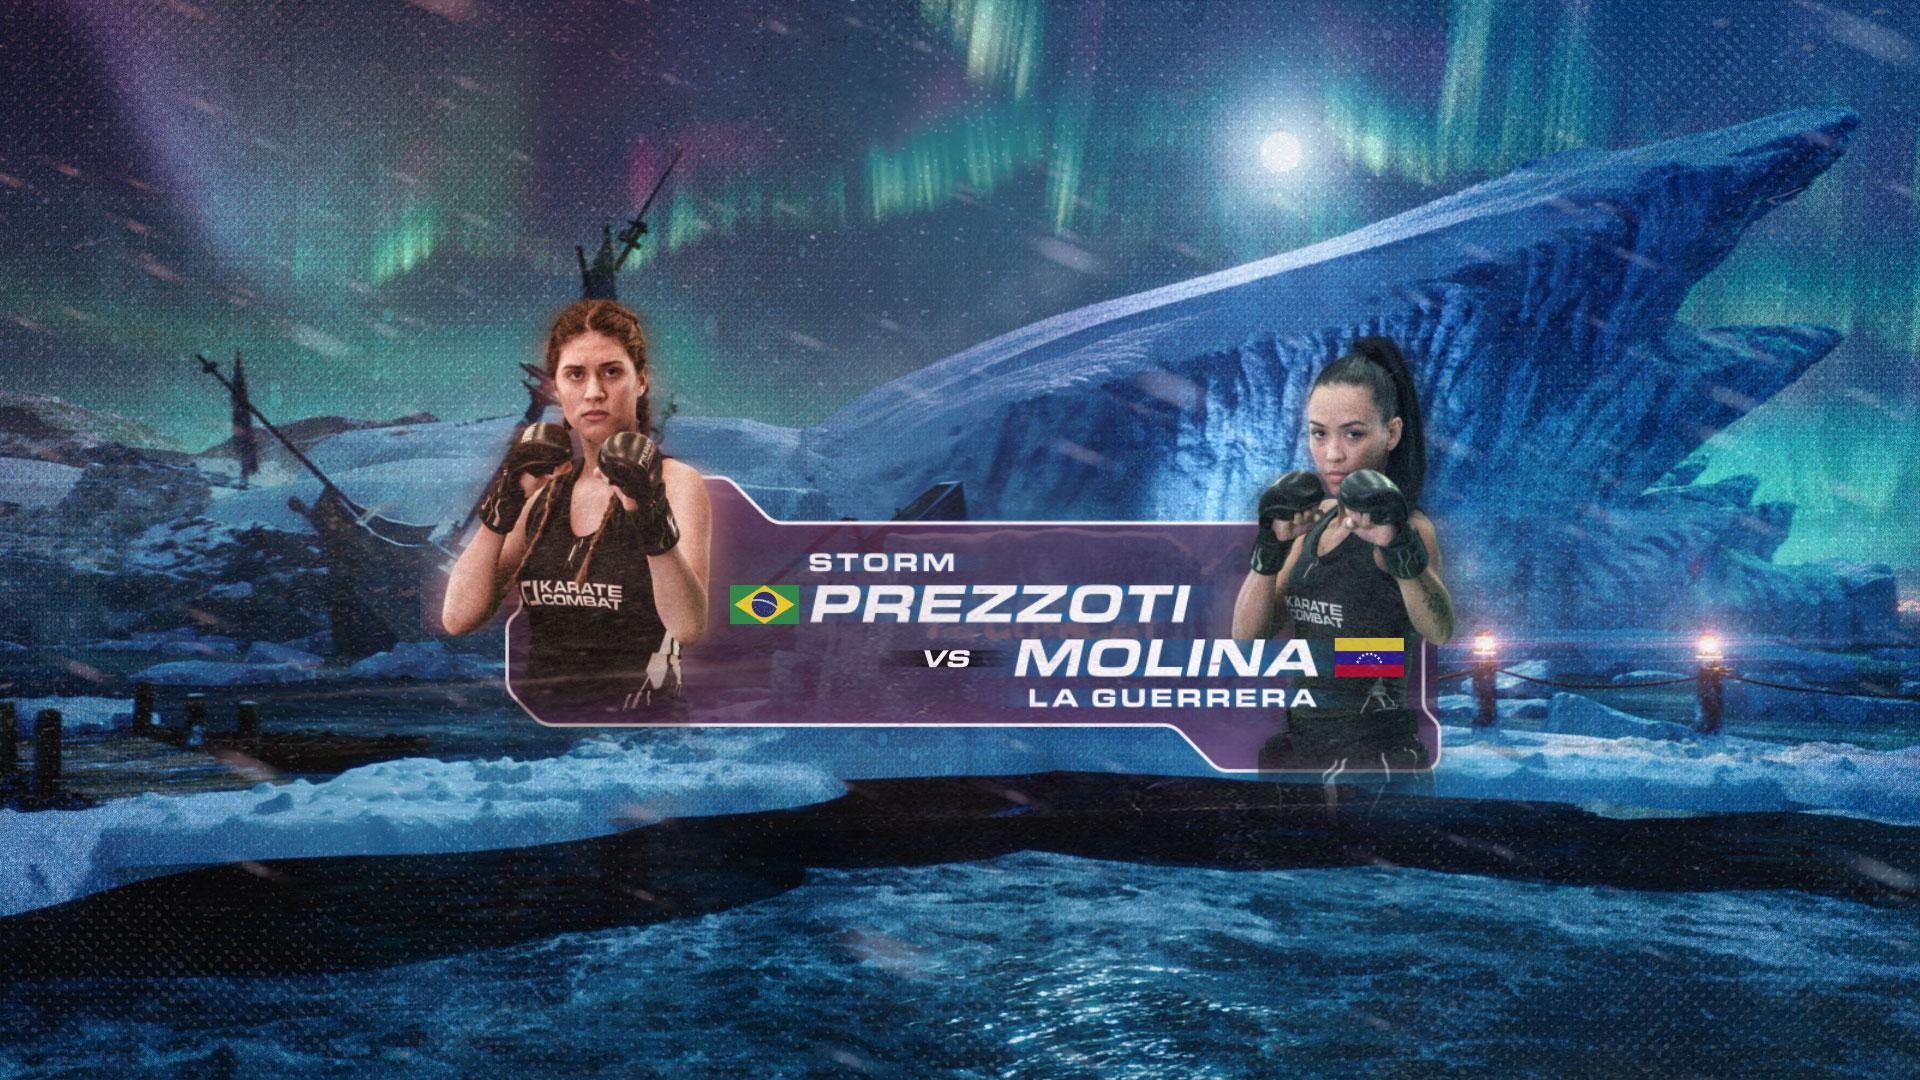 Prezzoti vs Molina